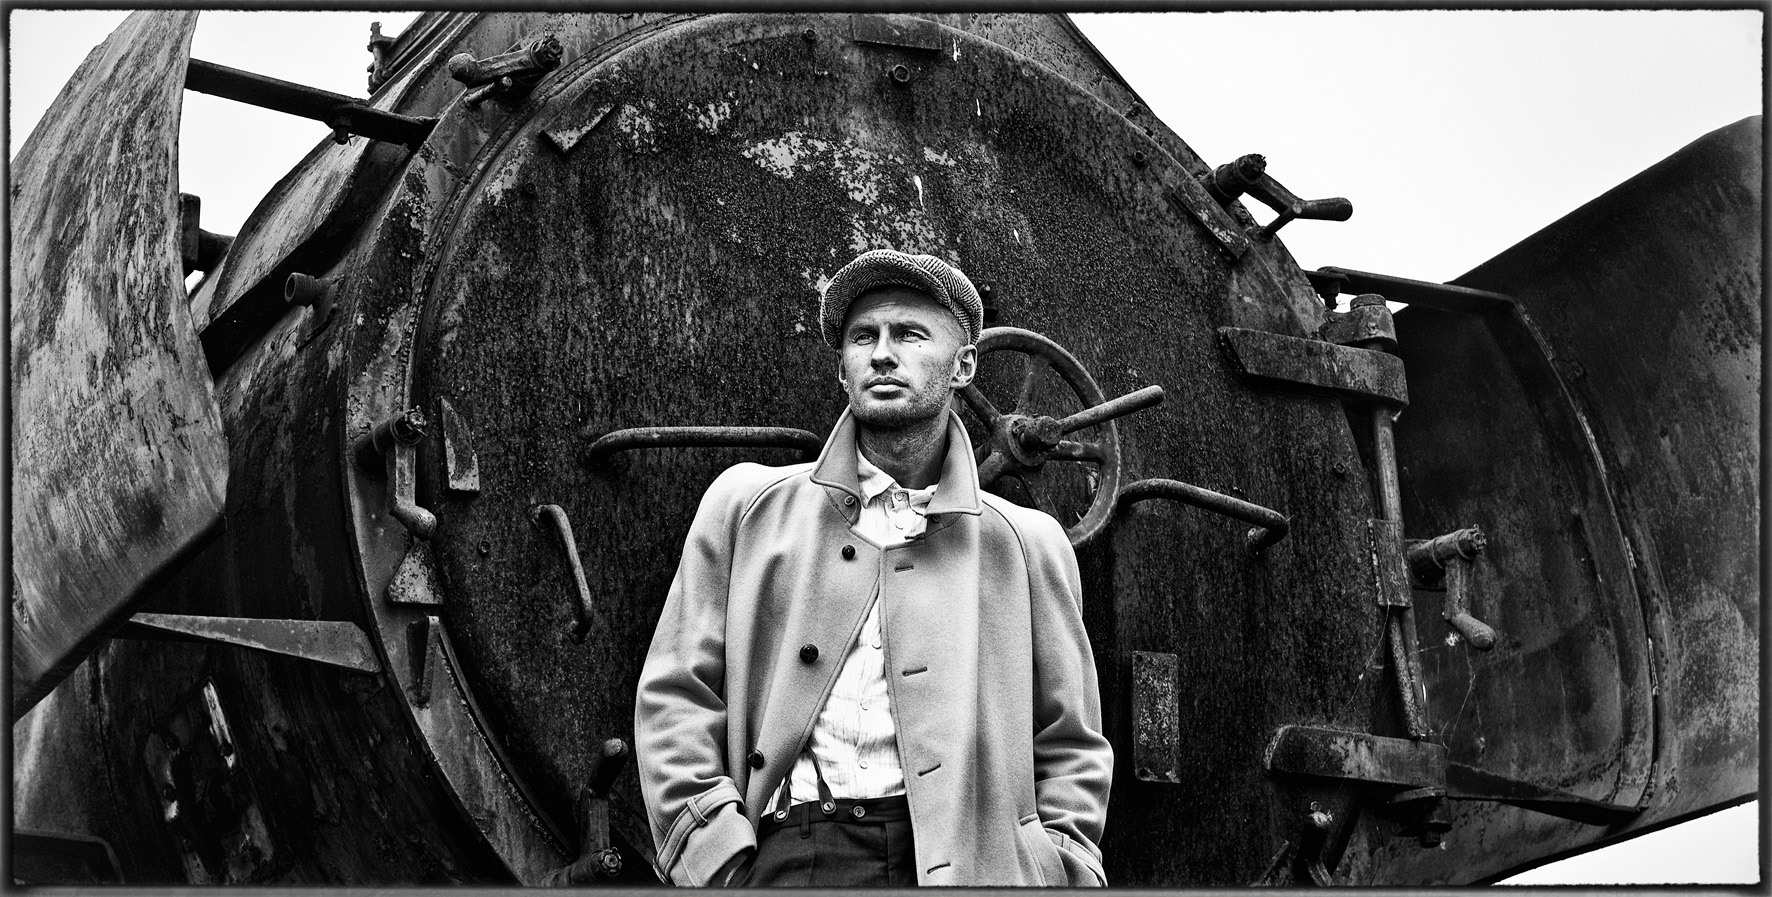 Evgeniy Levchenko - back in time